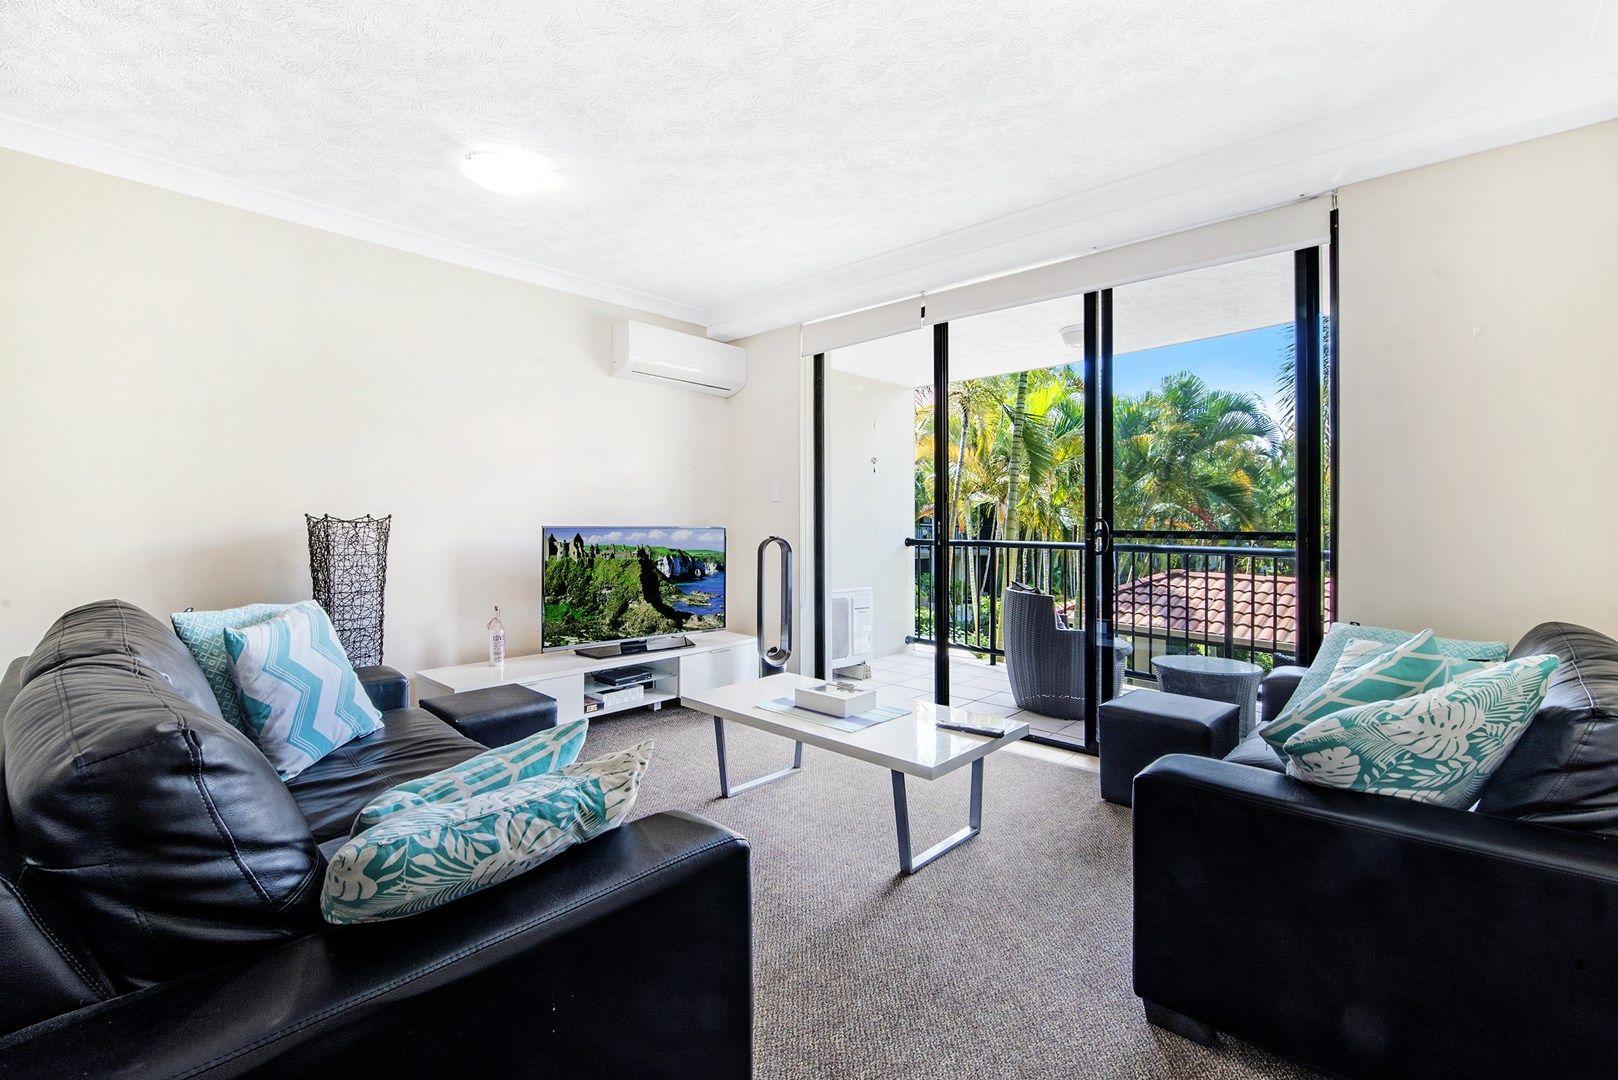 51/14-16 Markeri Street, Mermaid Beach QLD 4218, Image 0